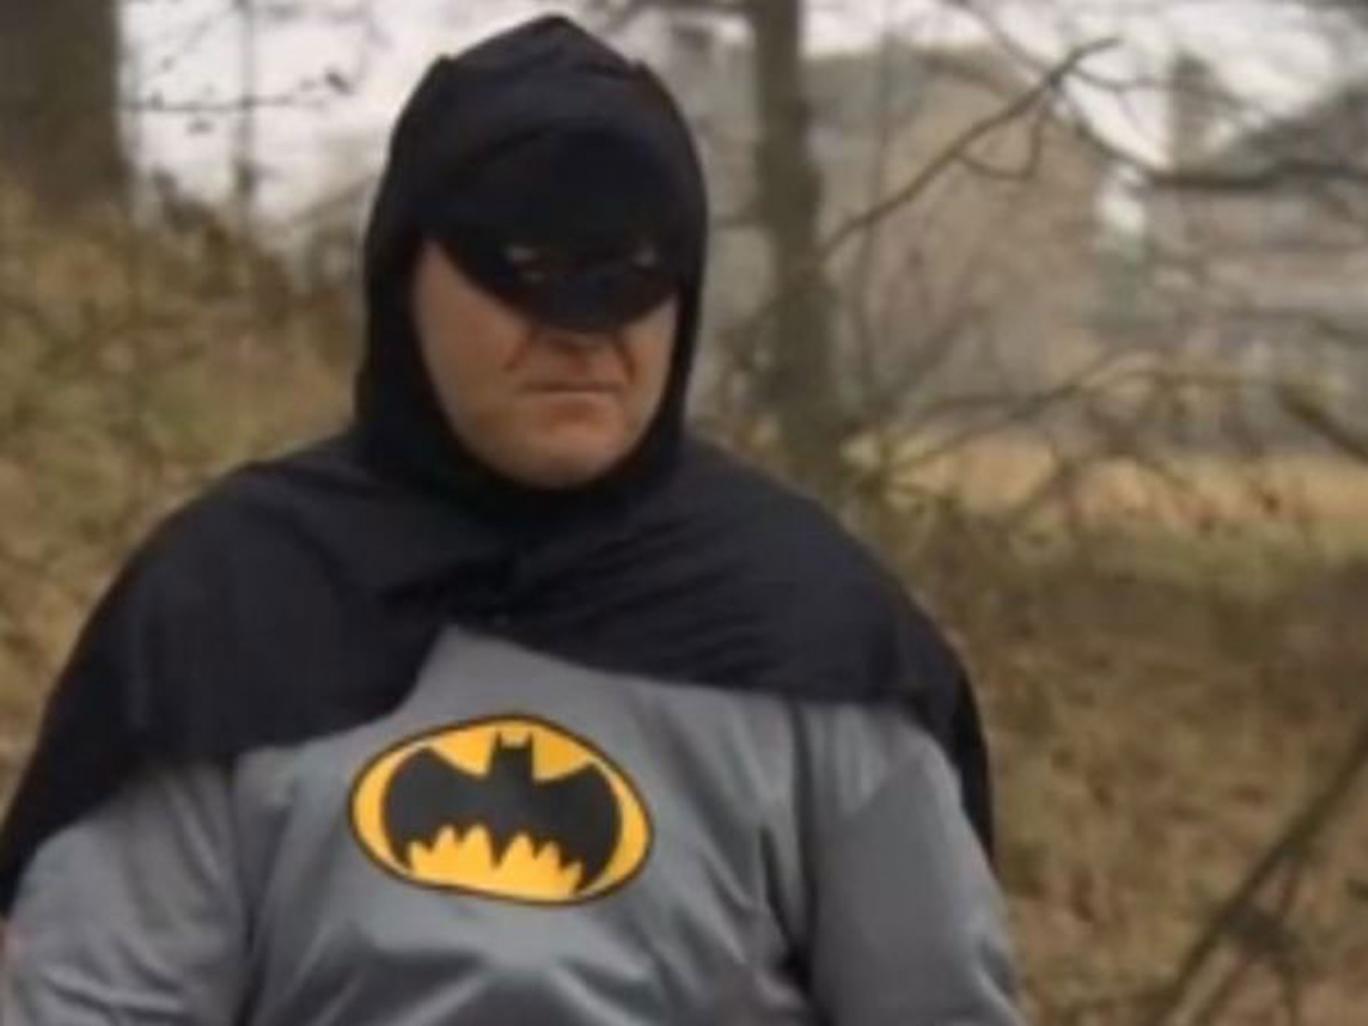 The Bradford Batman, unmasked this week